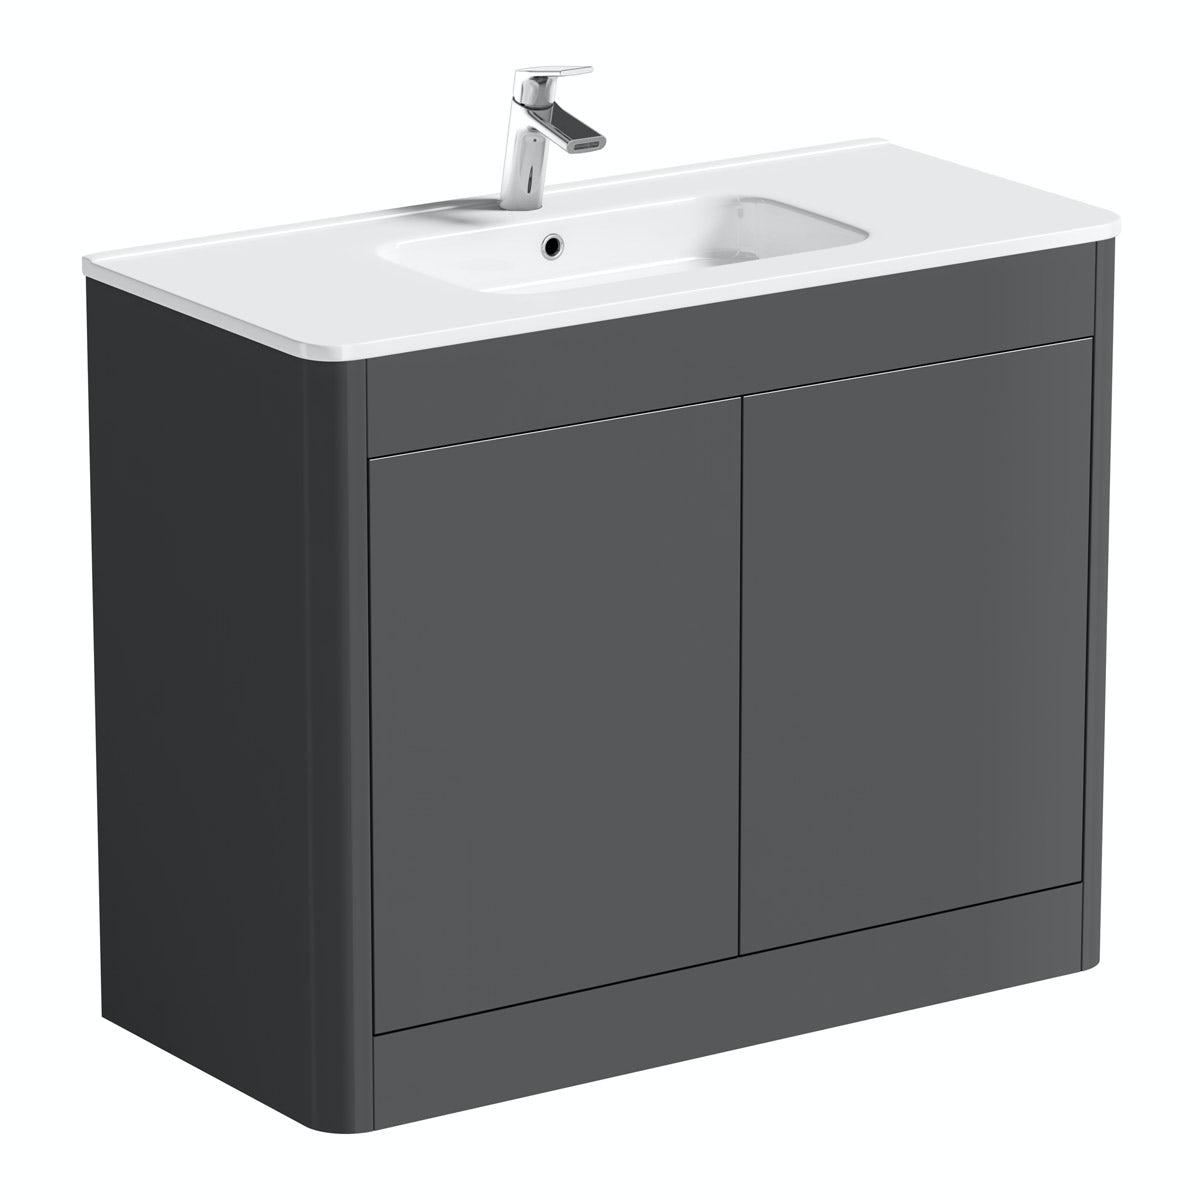 Carter pebble grey 1000 floor mounted vanity unit with basin